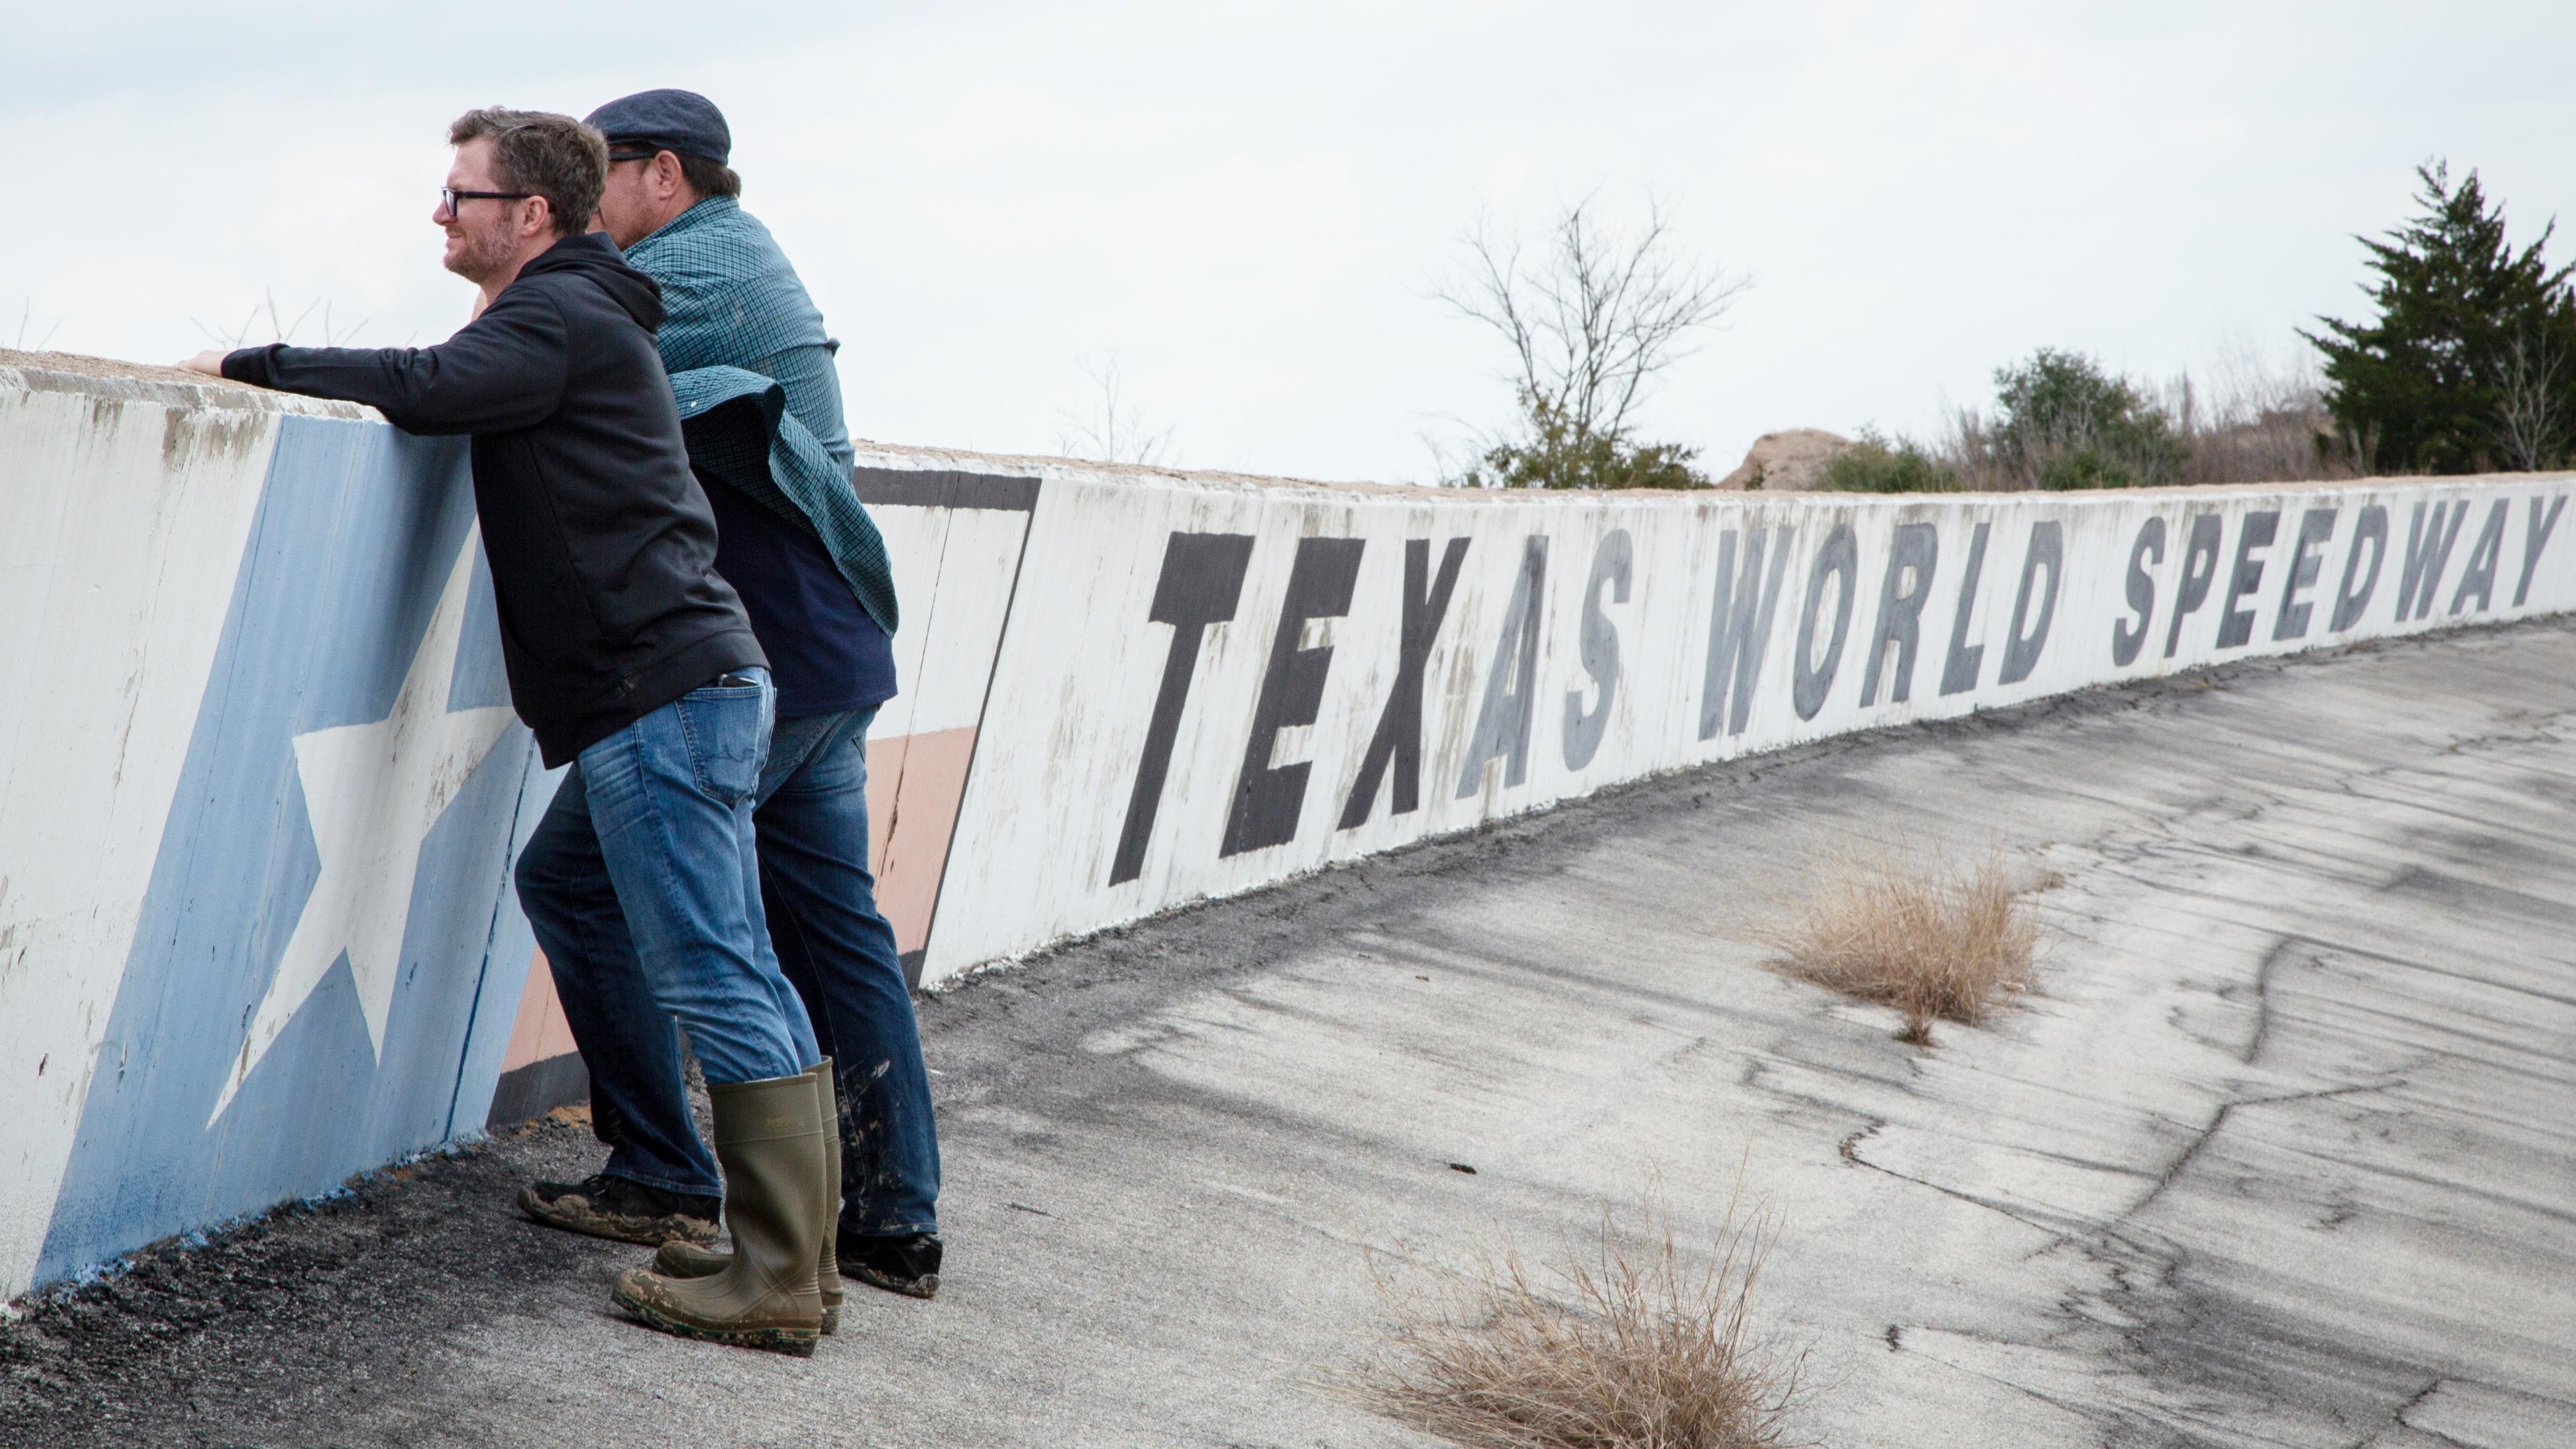 Texas World Speedway: Lonely Star